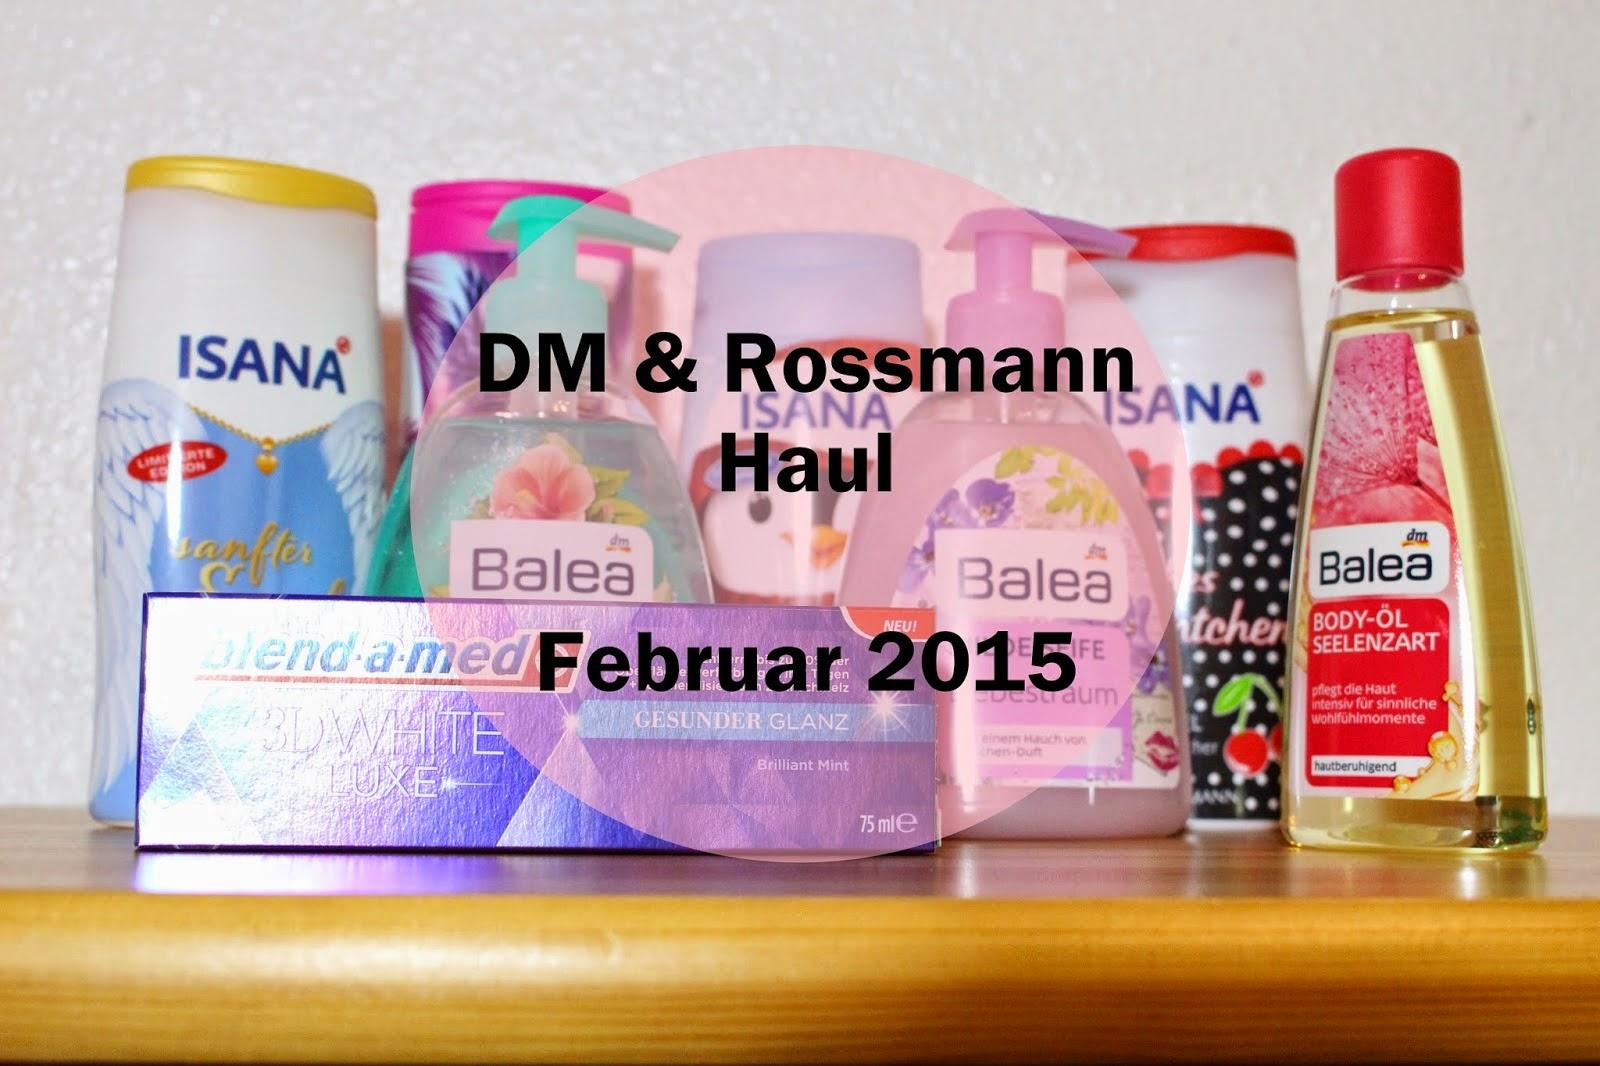 DM Rossmann Haul